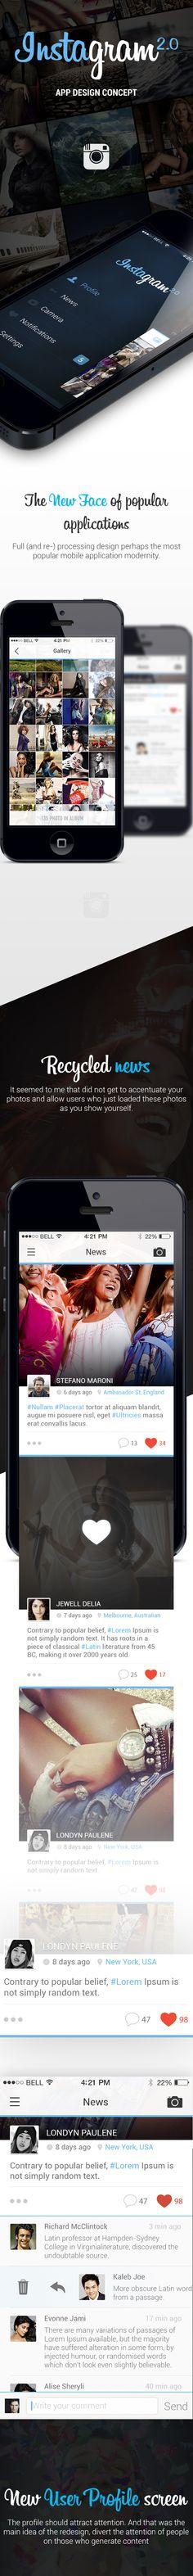 Instagram. App Design Concept on Behance